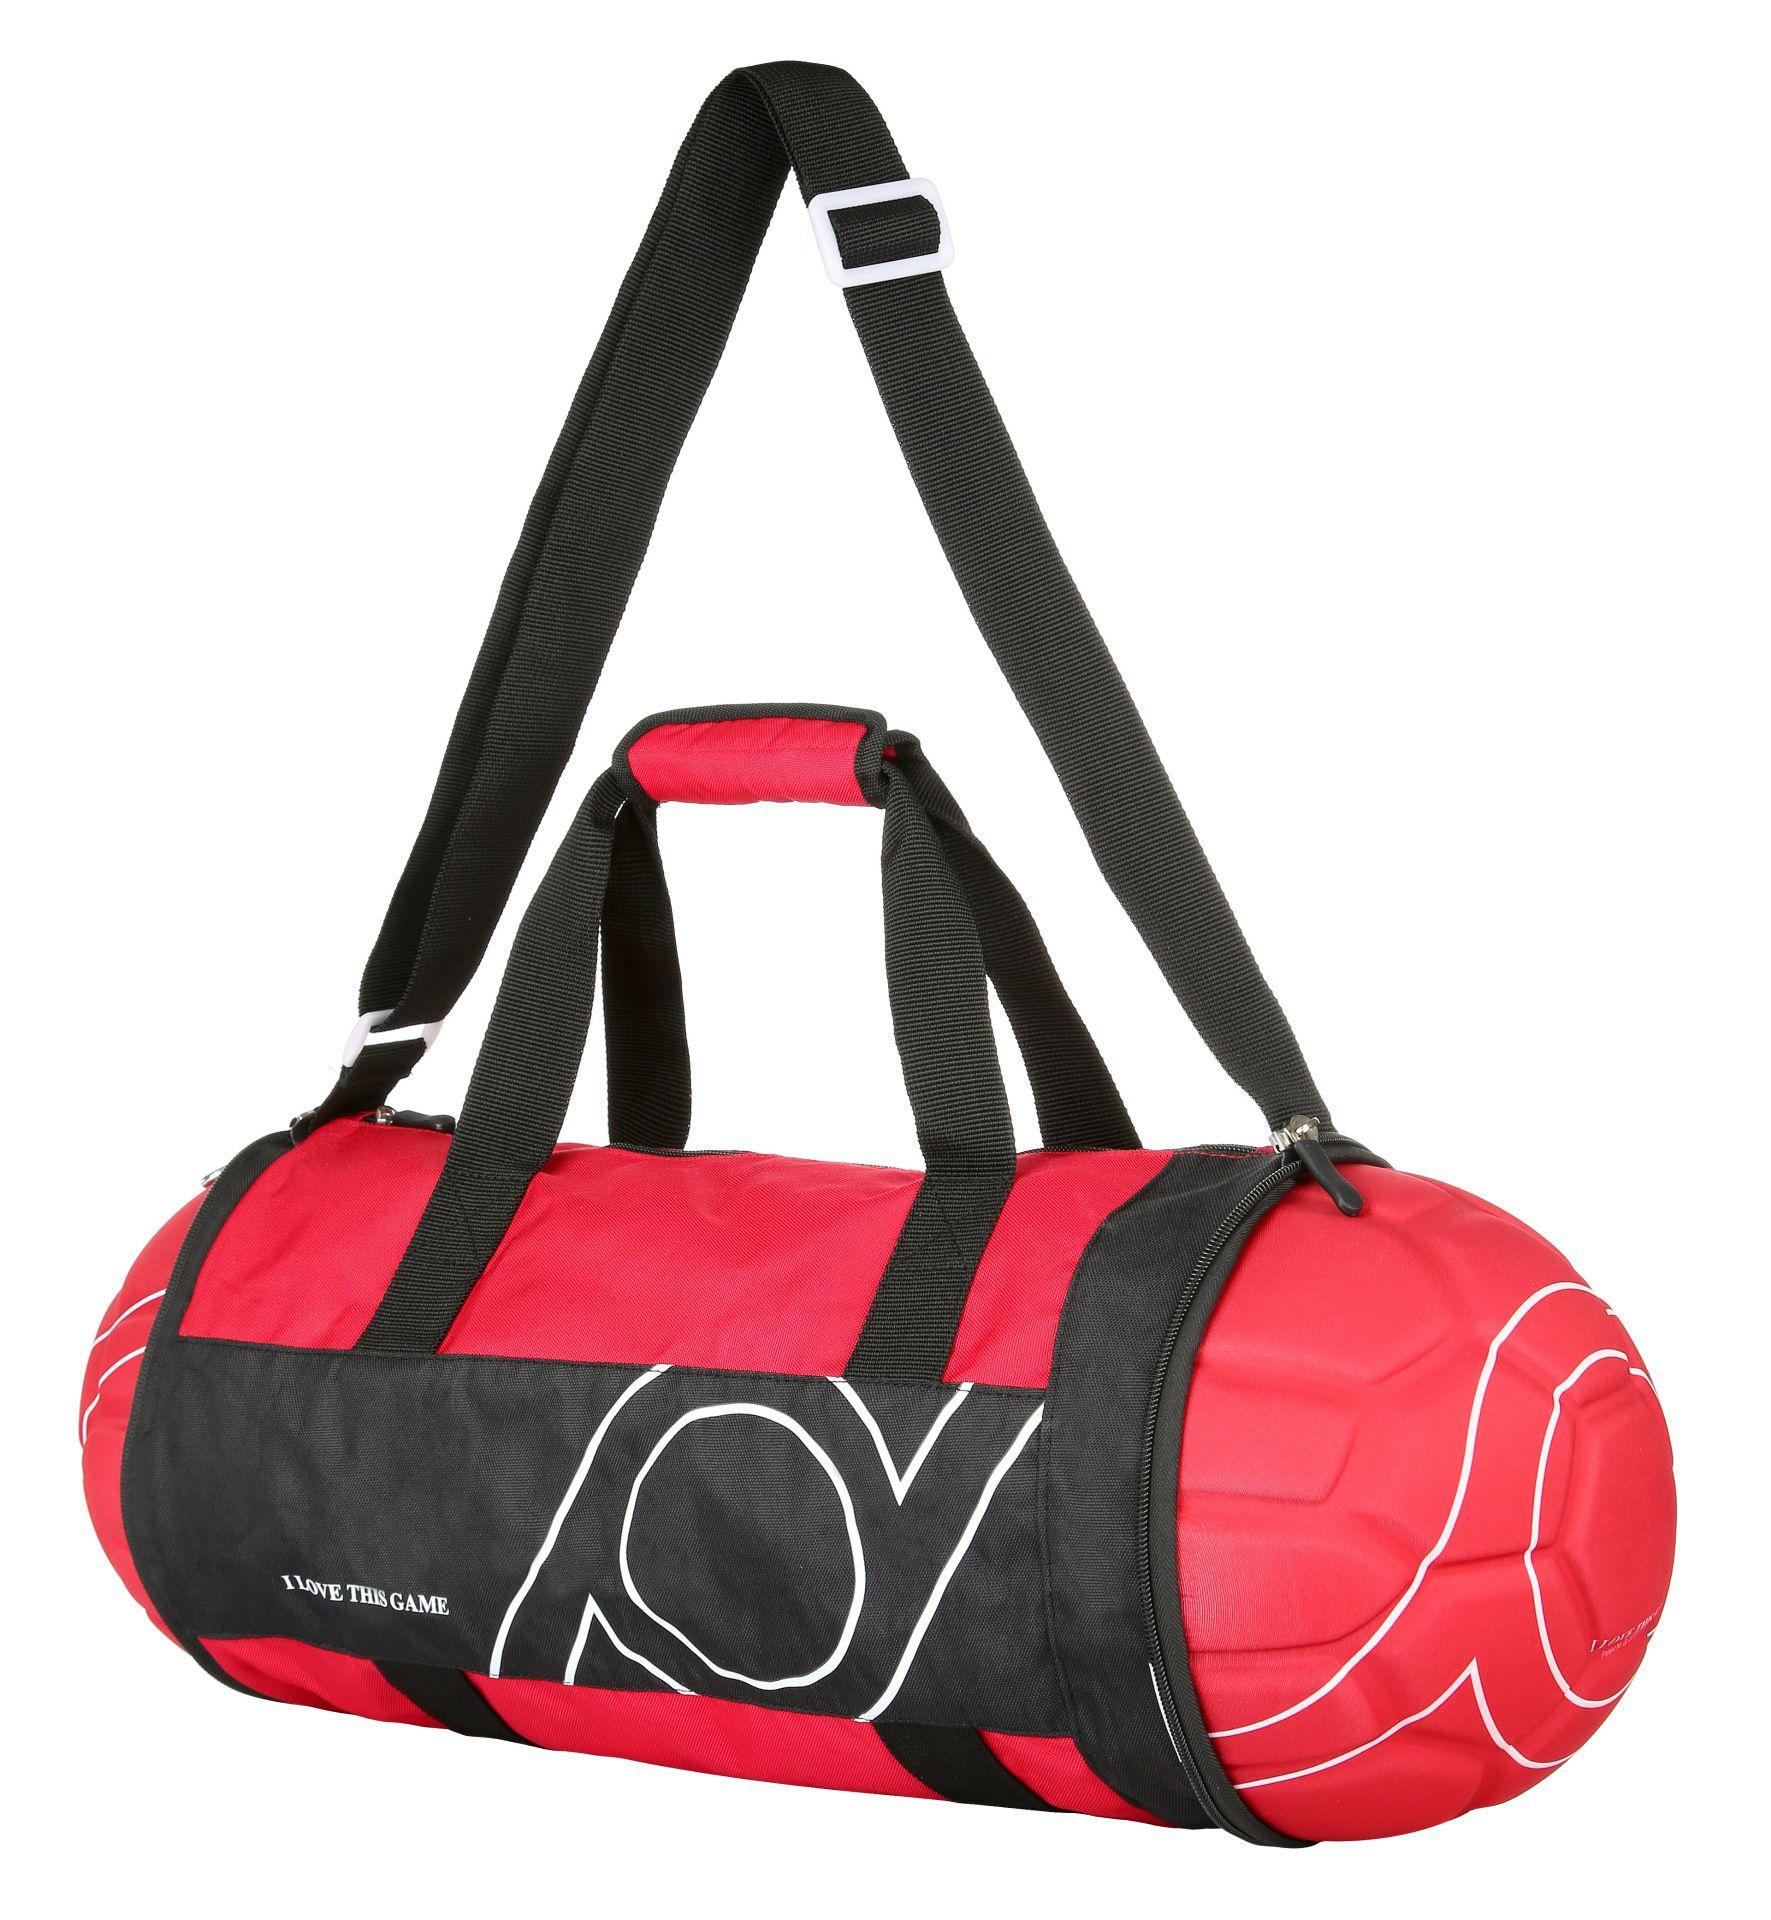 Unisex Football Shape Gym Sport Duffel Bag Travel Vacation Home Outdoor New  Duffel Bag c6b620aa16733